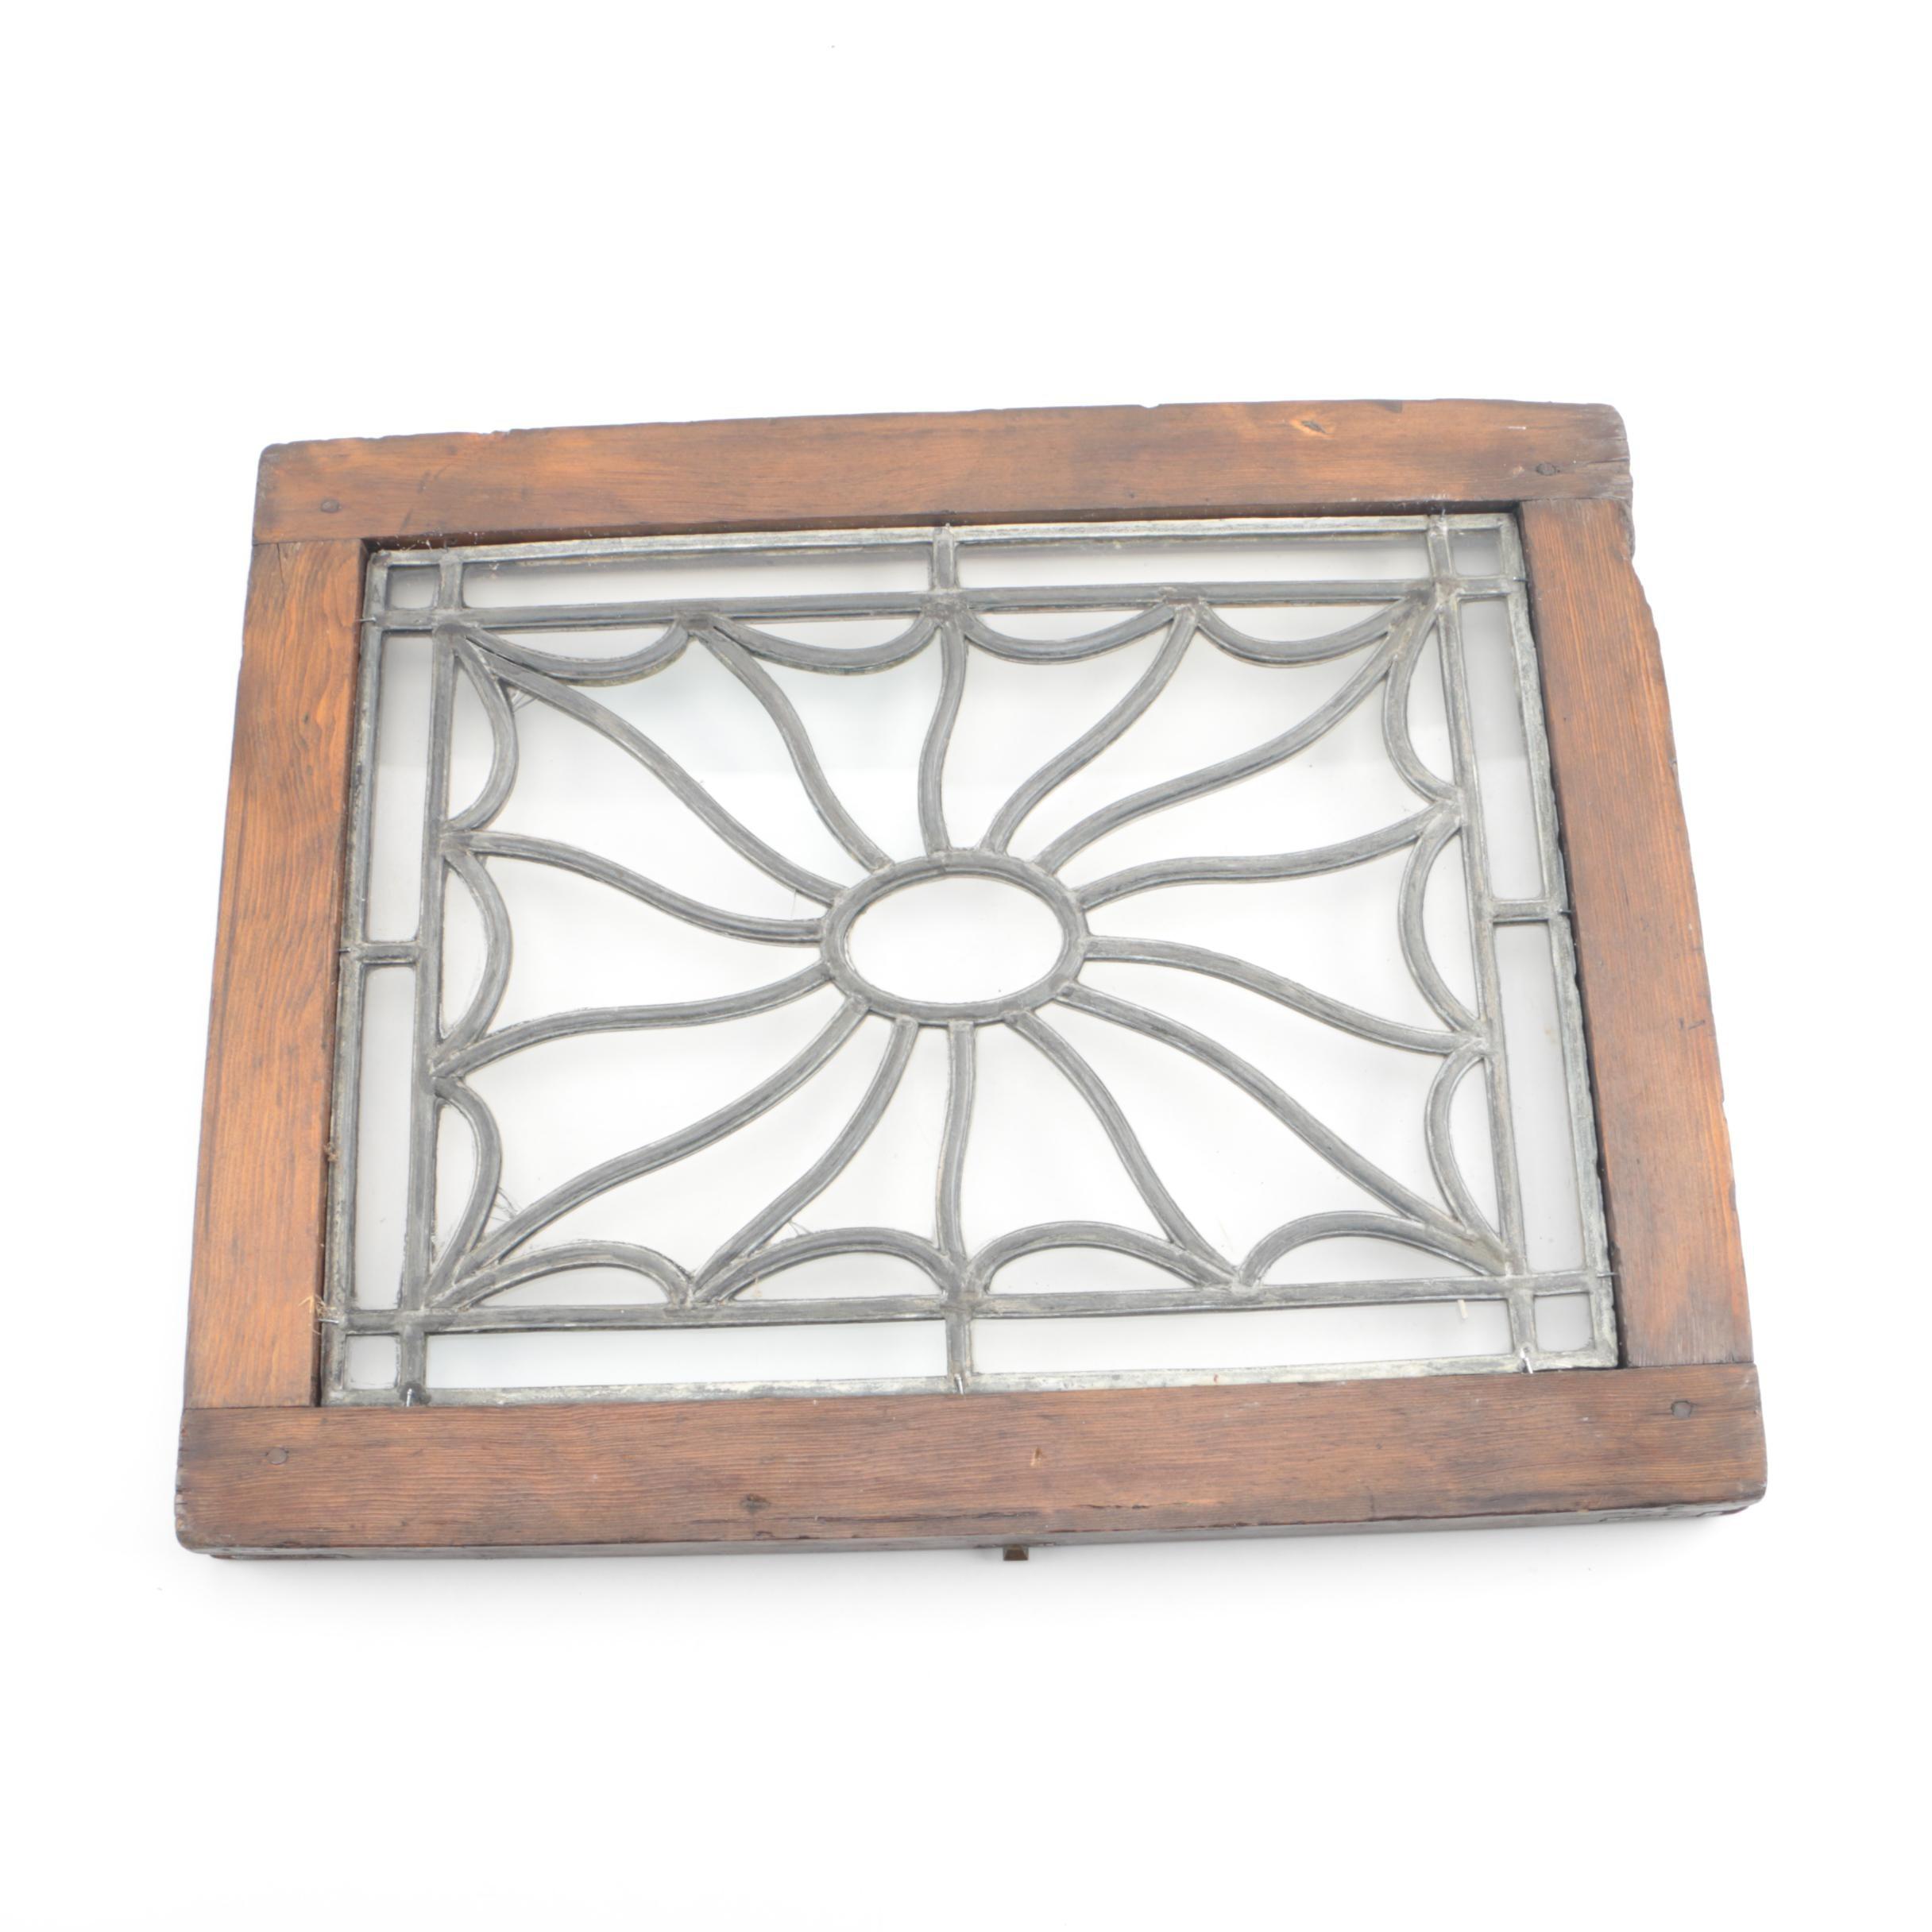 Leaded Glass Window with Wood Frame